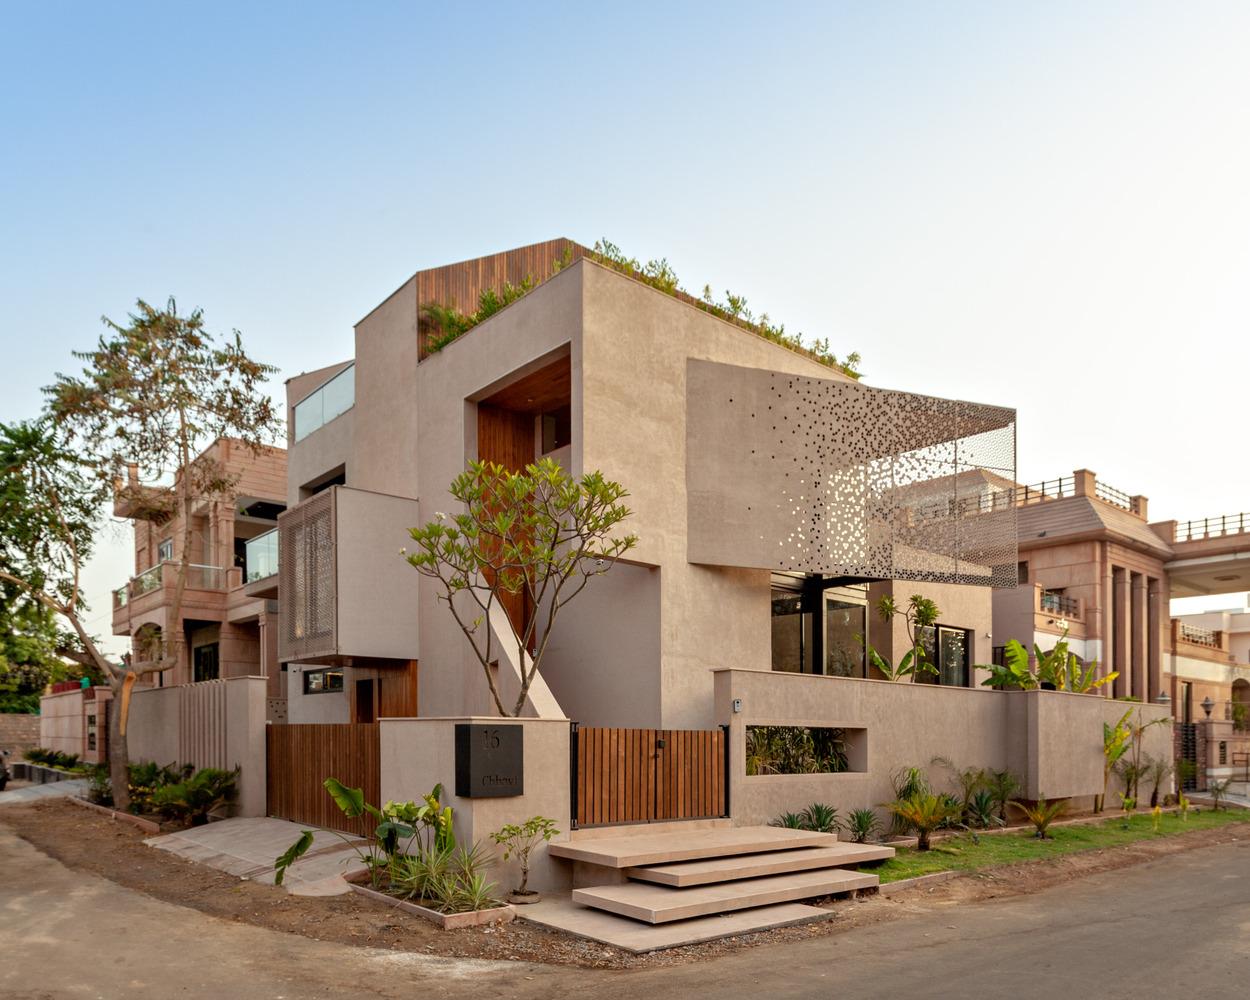 Chhavi House by Abraham John Architects